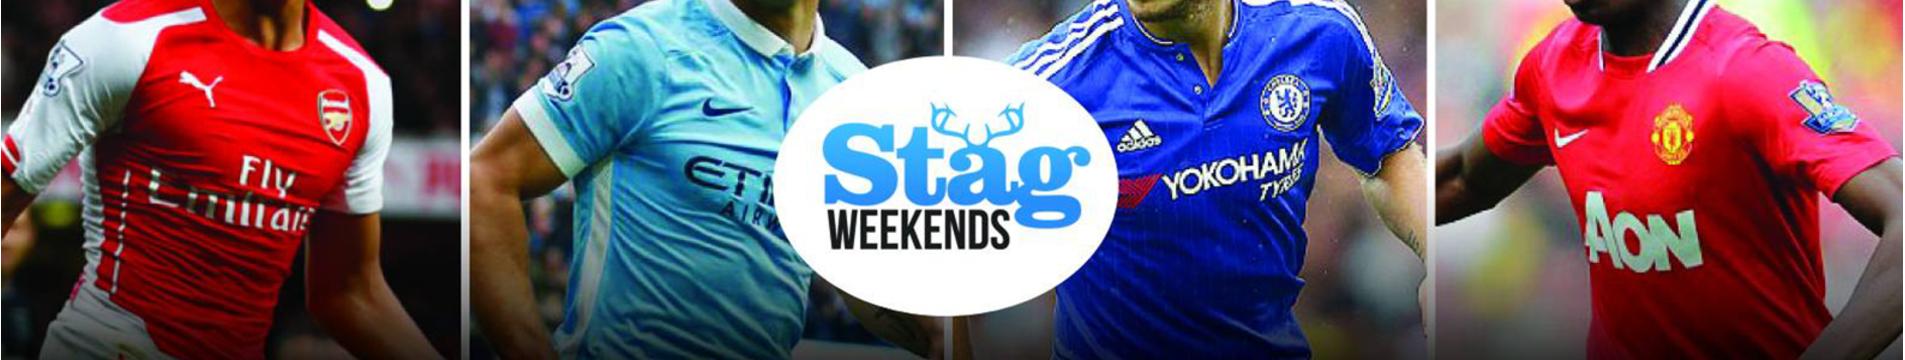 stag-weekends-premier-league-preview.jpg